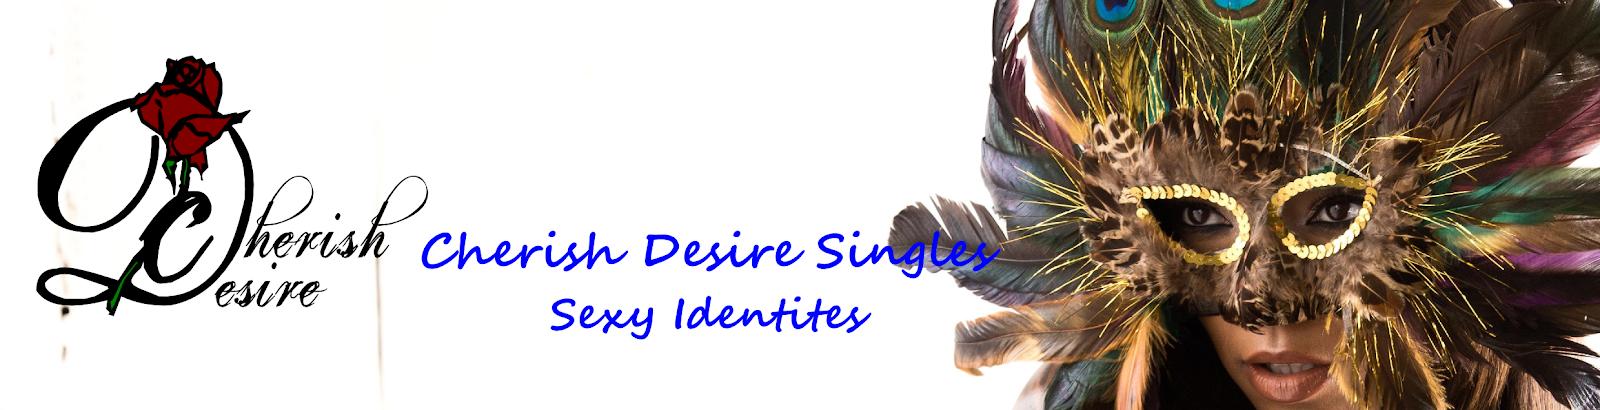 Cherish Desire Singles Sexy Identities, Max D, erotica